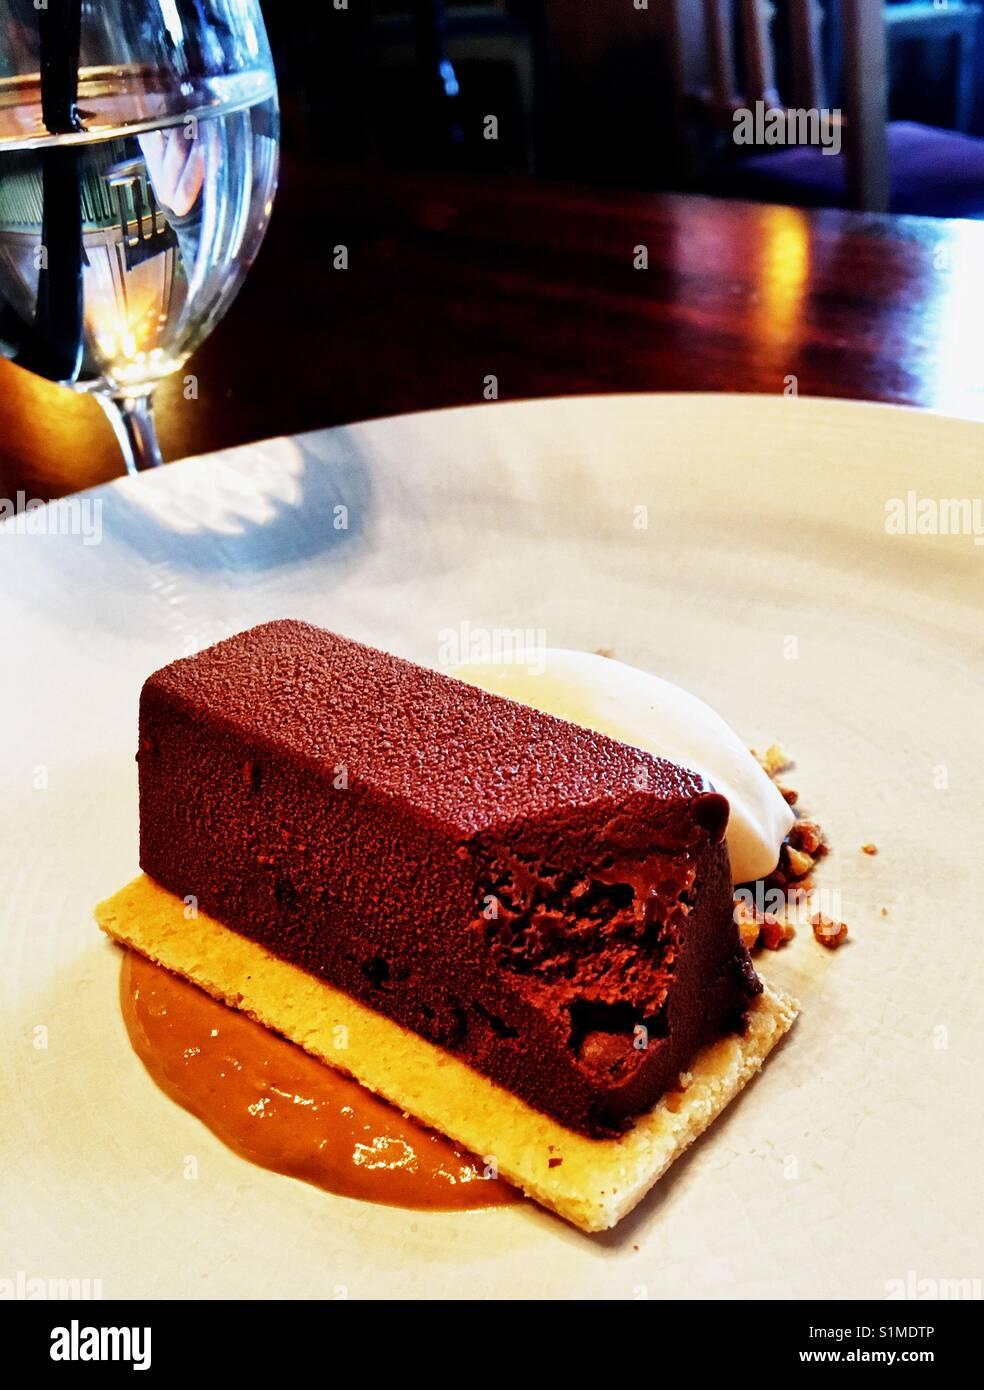 Chocolate Dessert - Stock Image